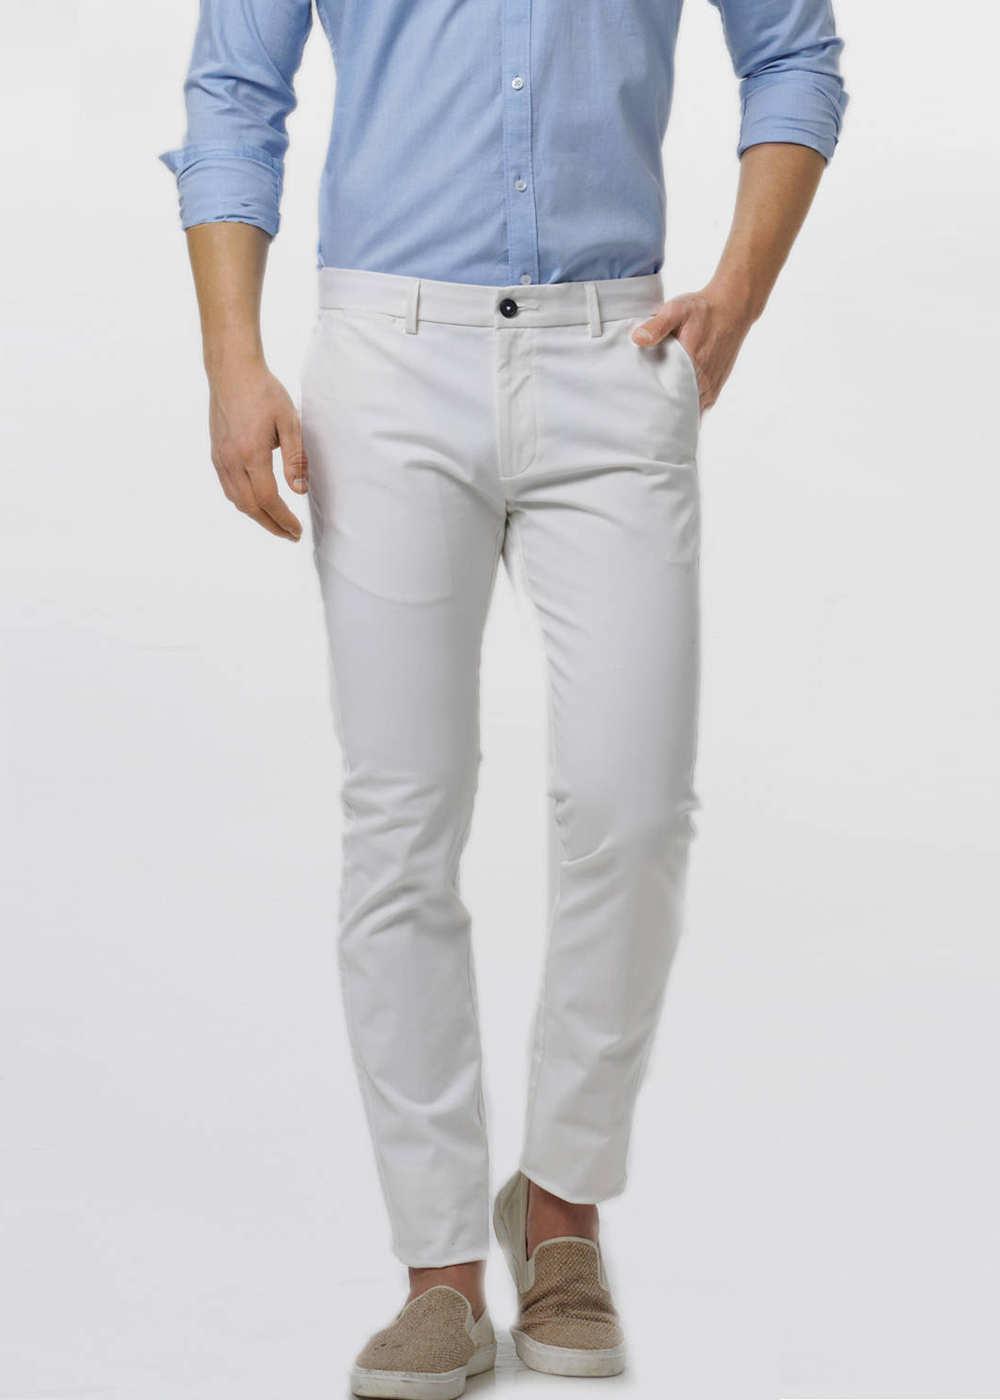 Basics | Basics Tapered Fit Cloud White Twill Trouser